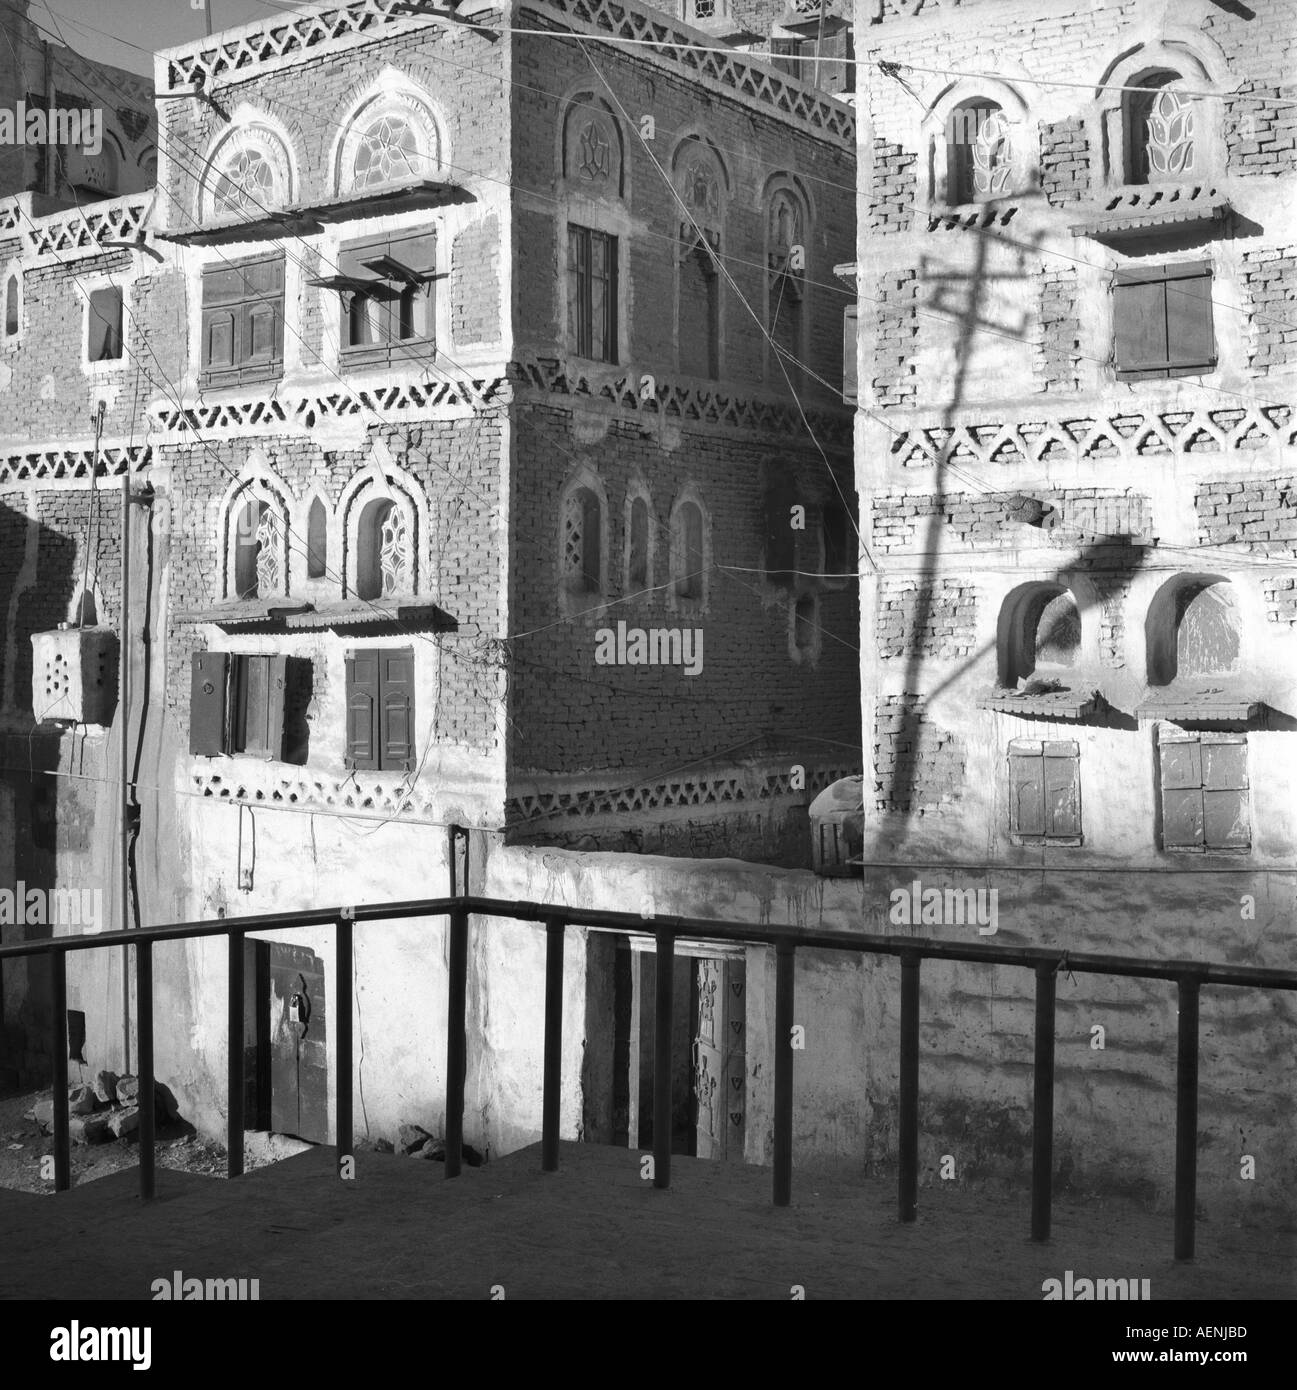 Traditional architecture Sanaa Yemen Arab Republic - Stock Image